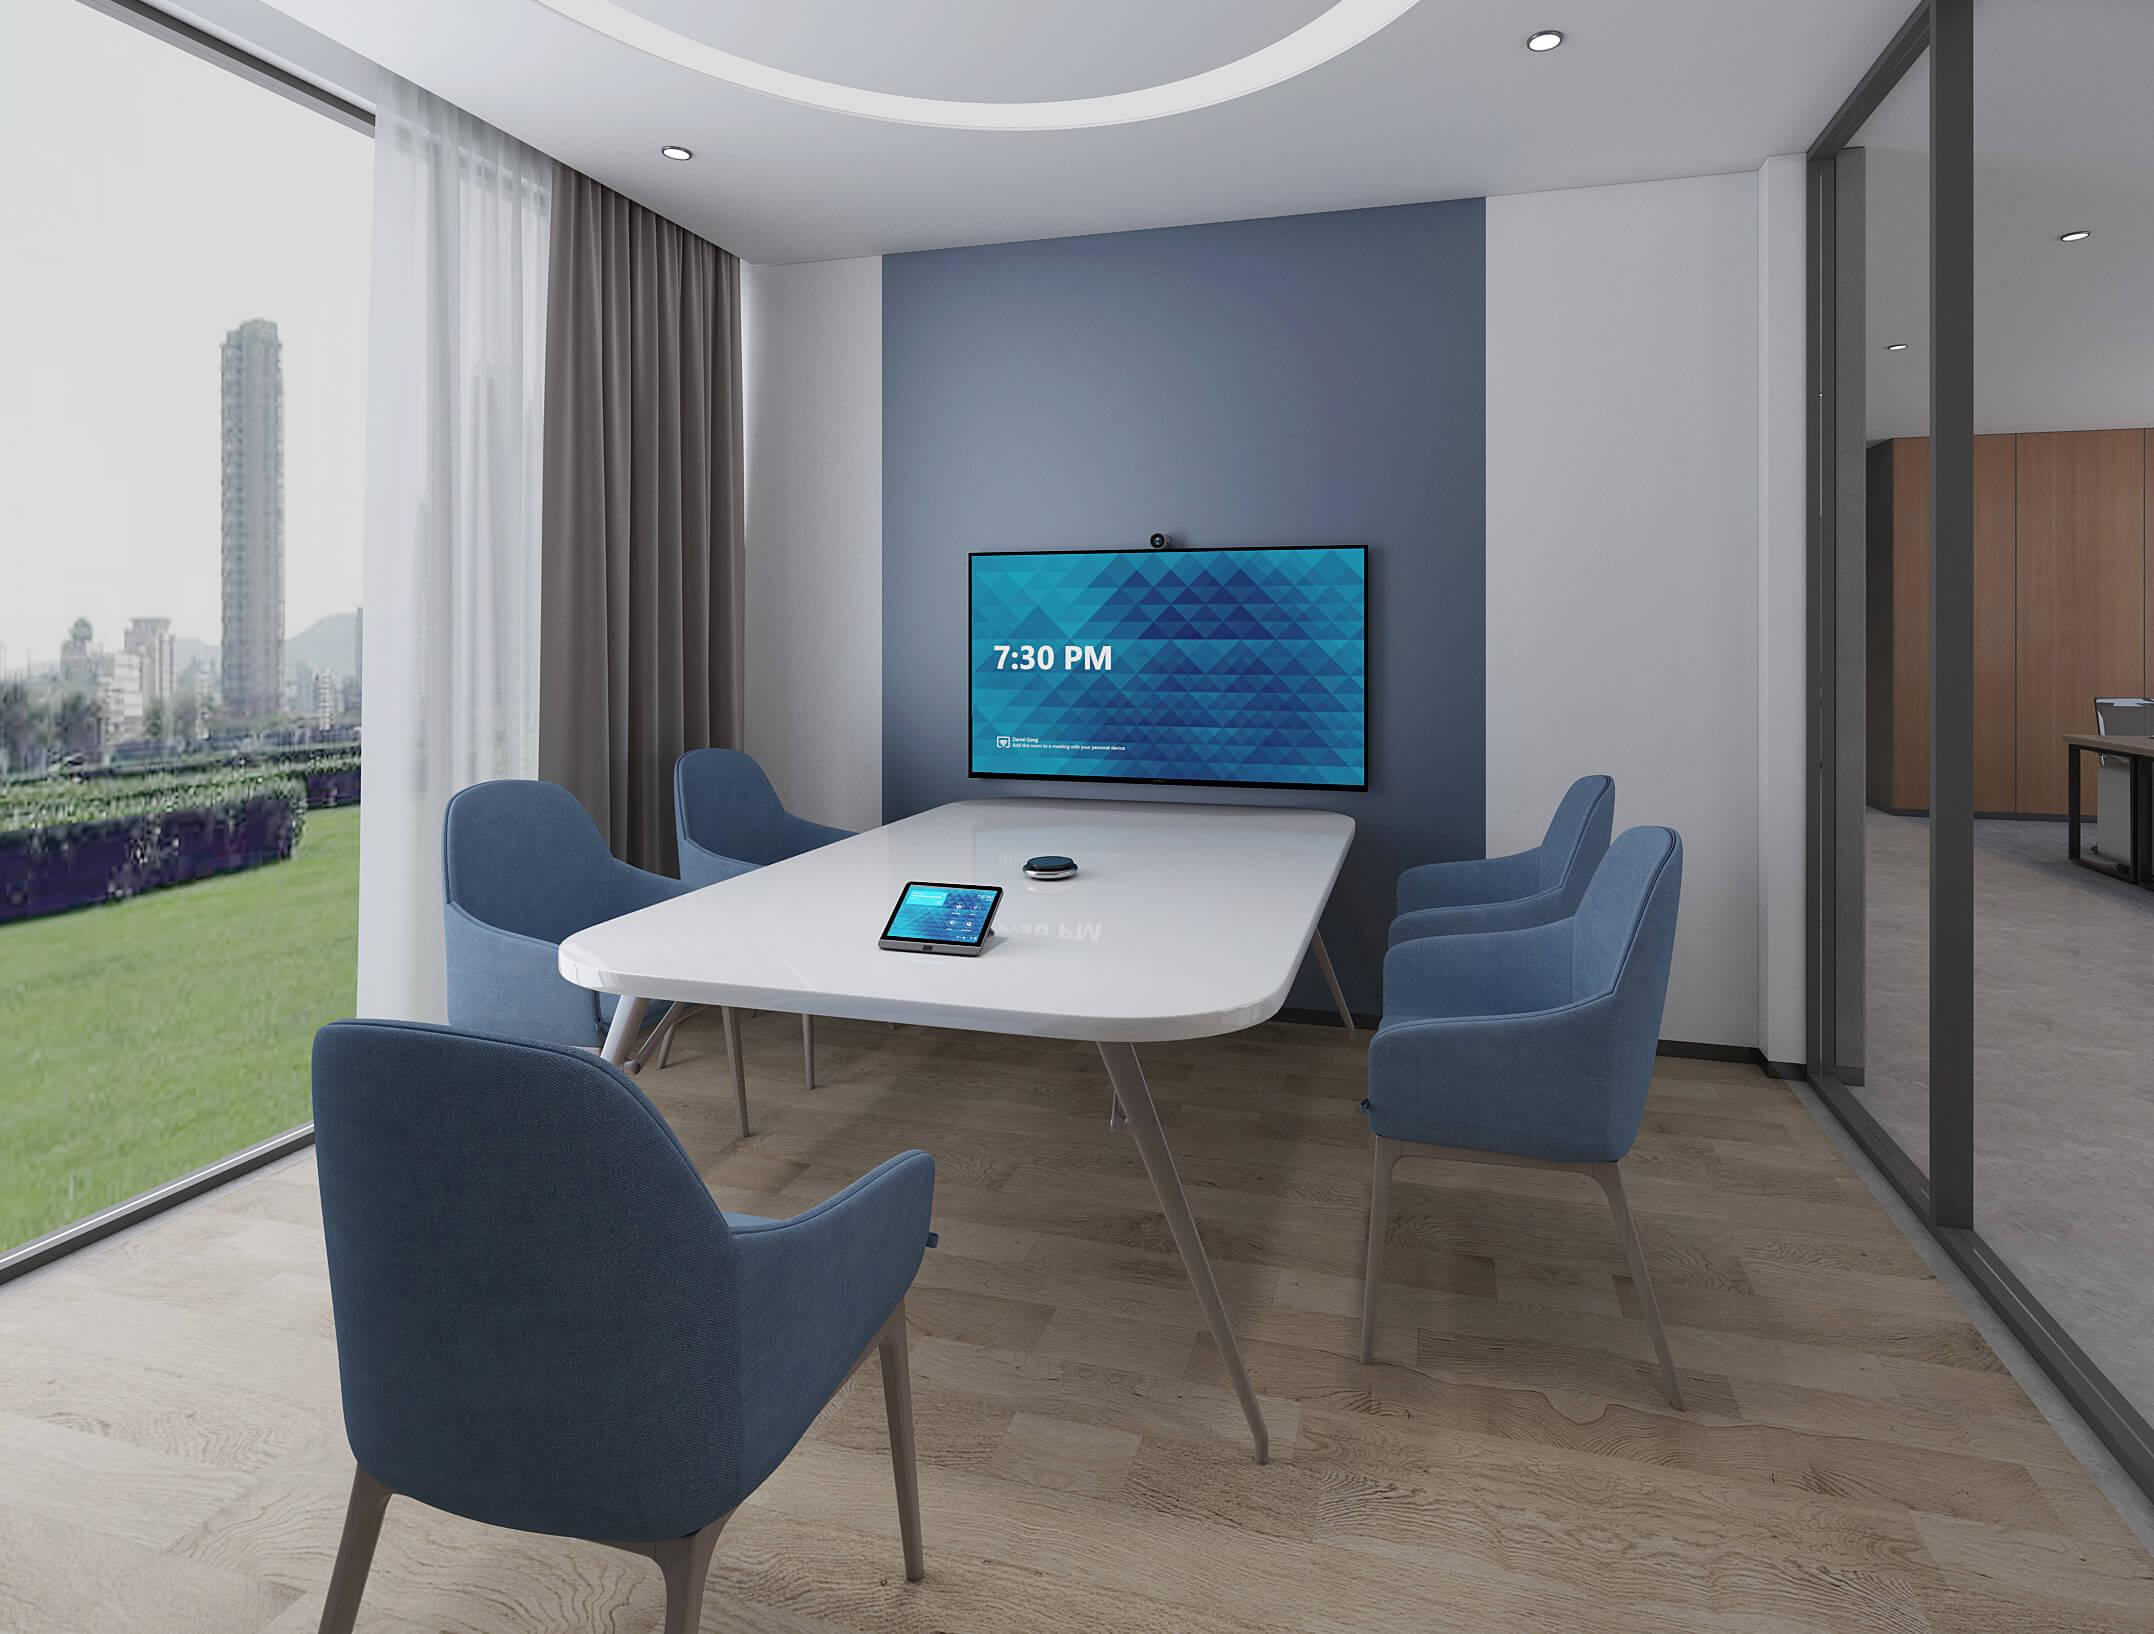 UVC30 Room_Cameras_Products